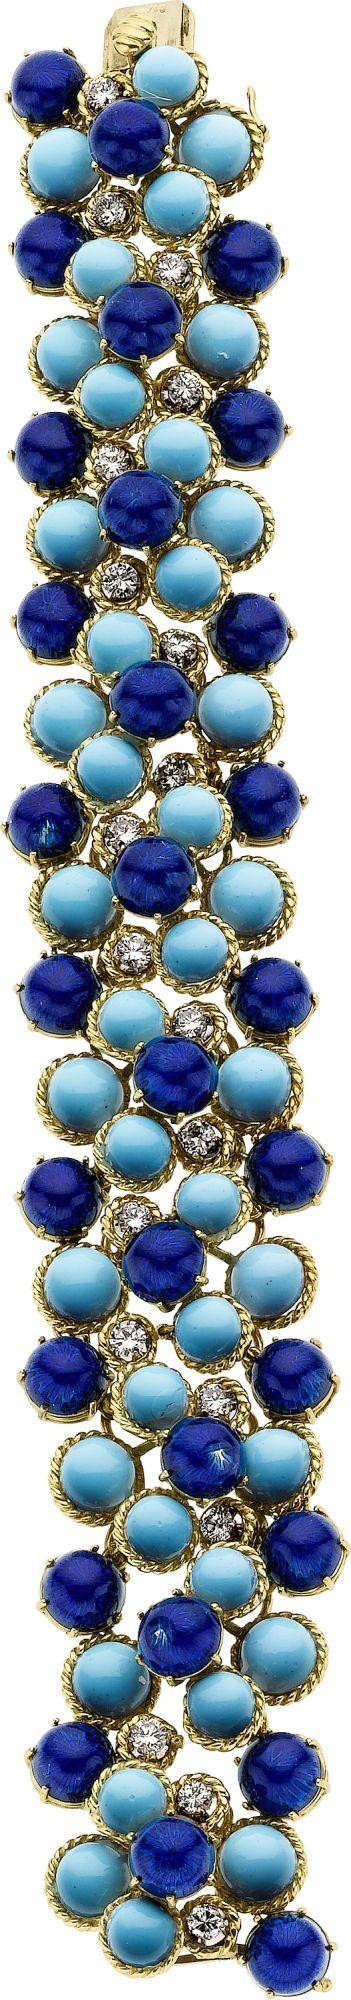 Diamond, Enamel, Gold Bracelet. ... Estate JewelryBracelets | Lot #58184 | Heritage Auctions